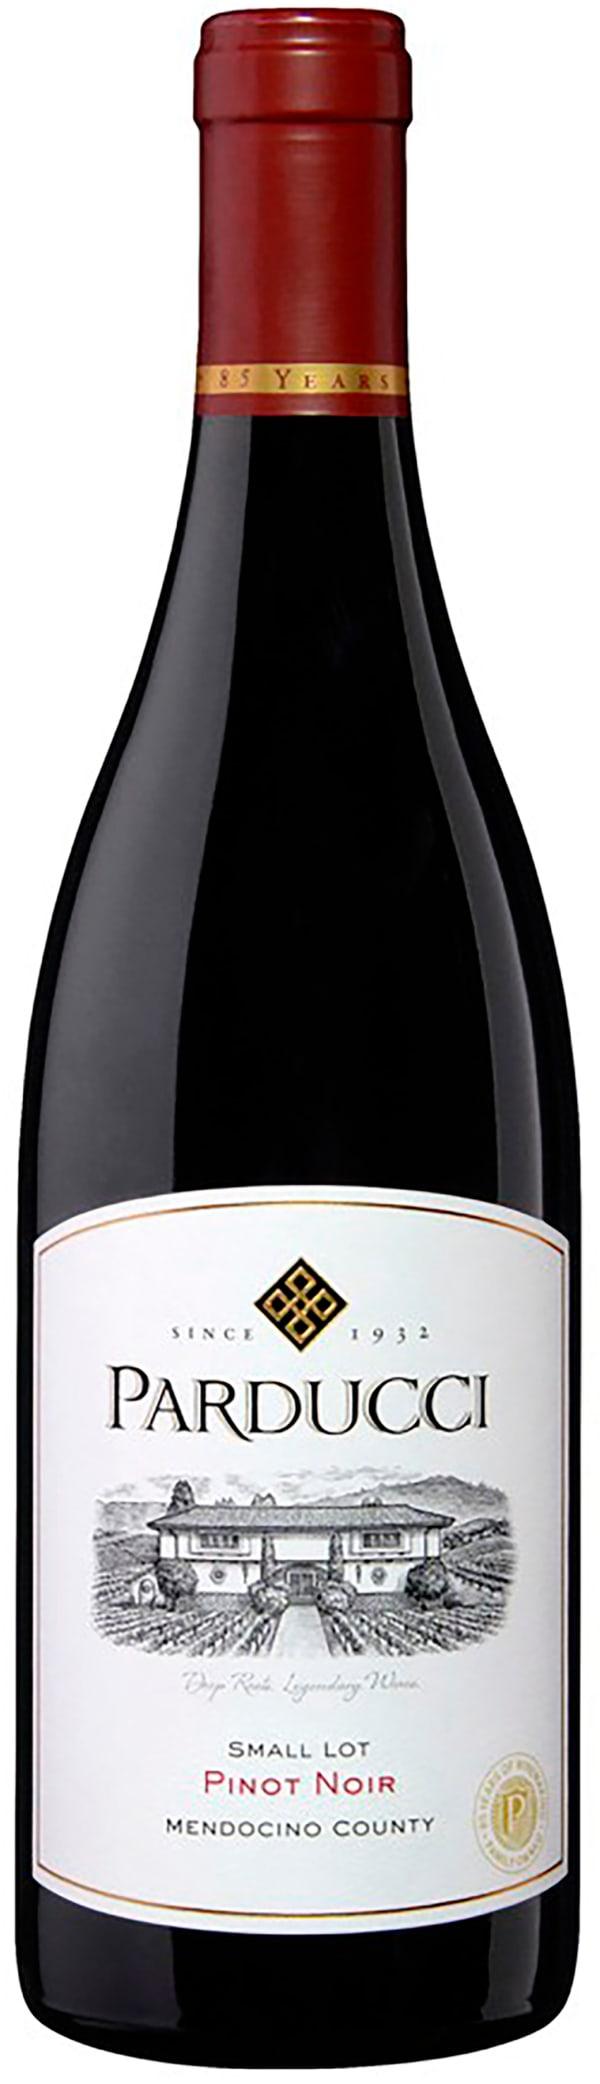 Parducci Small Lot Pinot Noir 2015